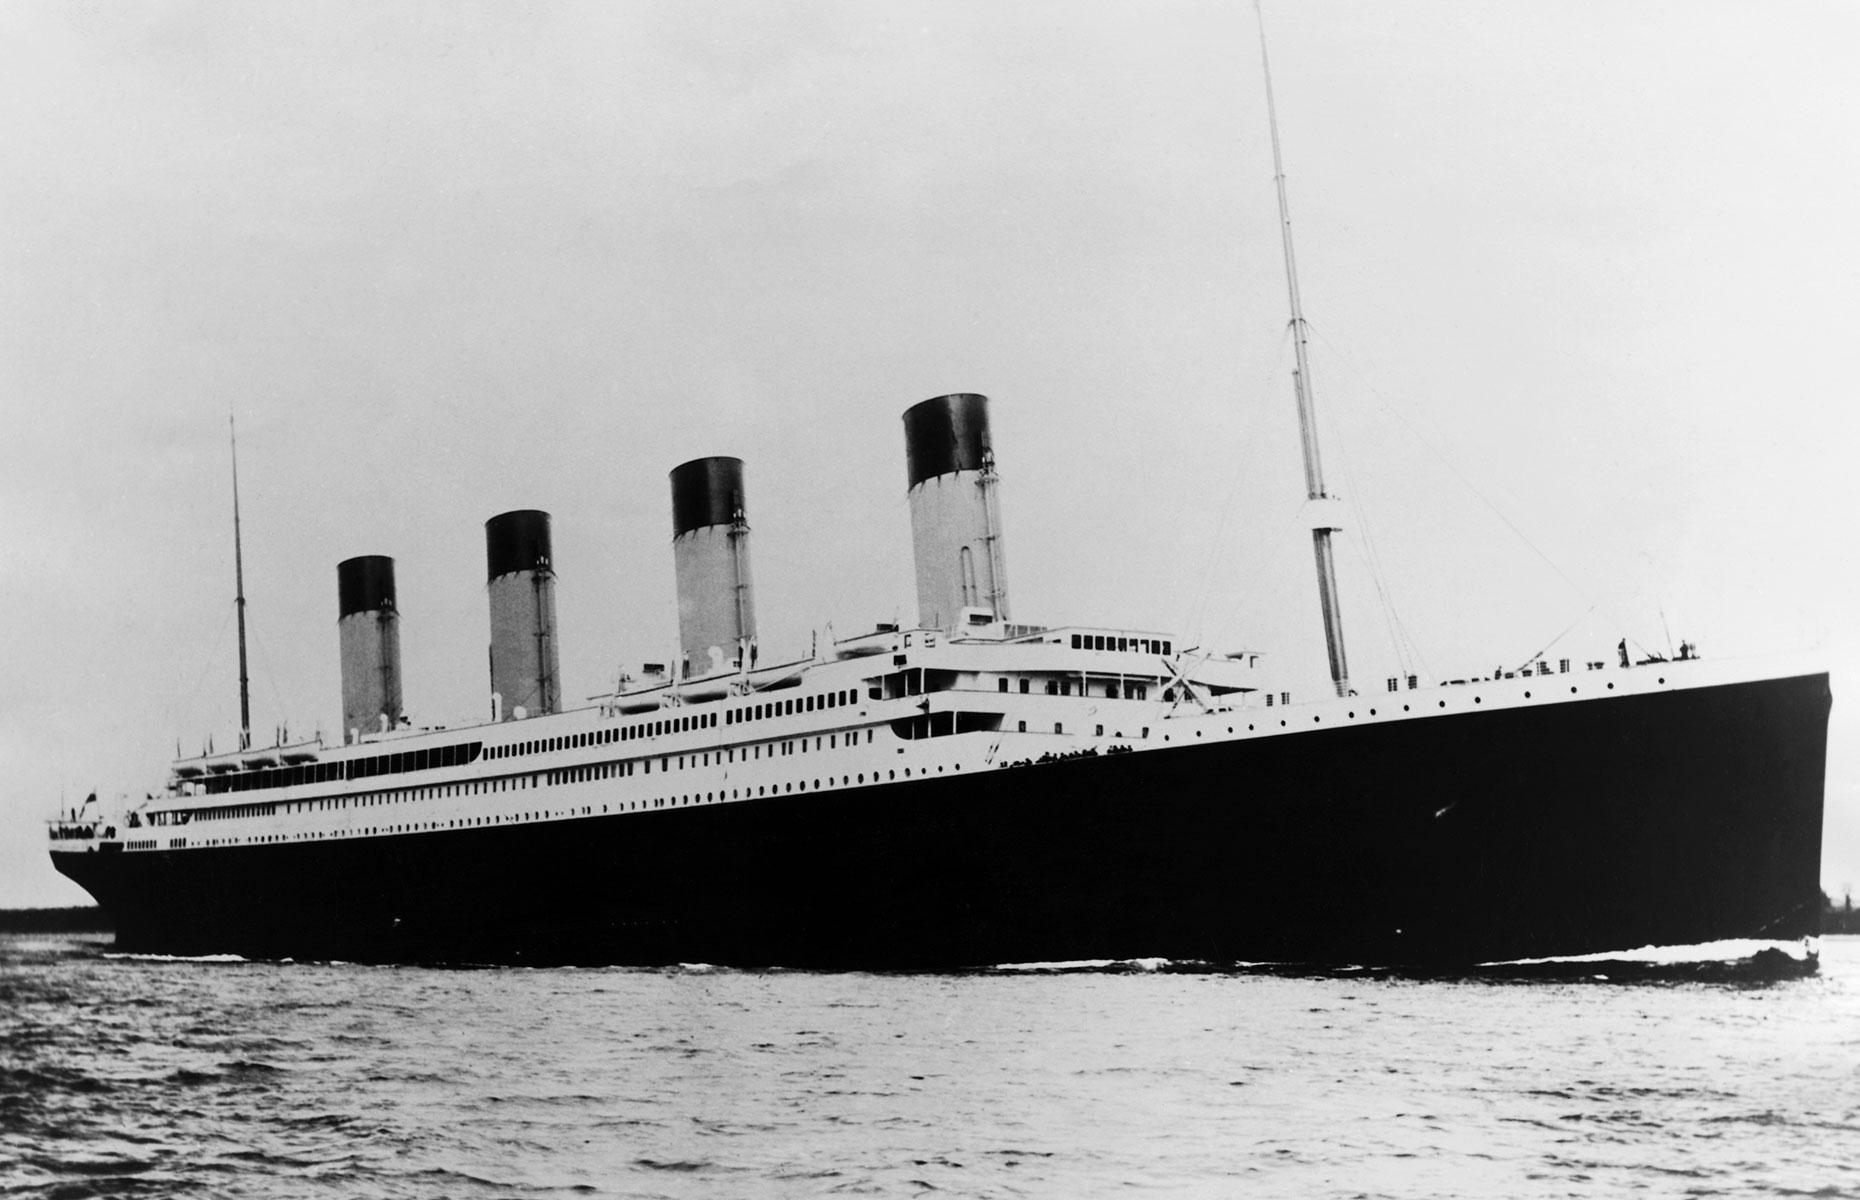 The RMS Titanic (Image: George Rinhart/Corbis via Getty Images)